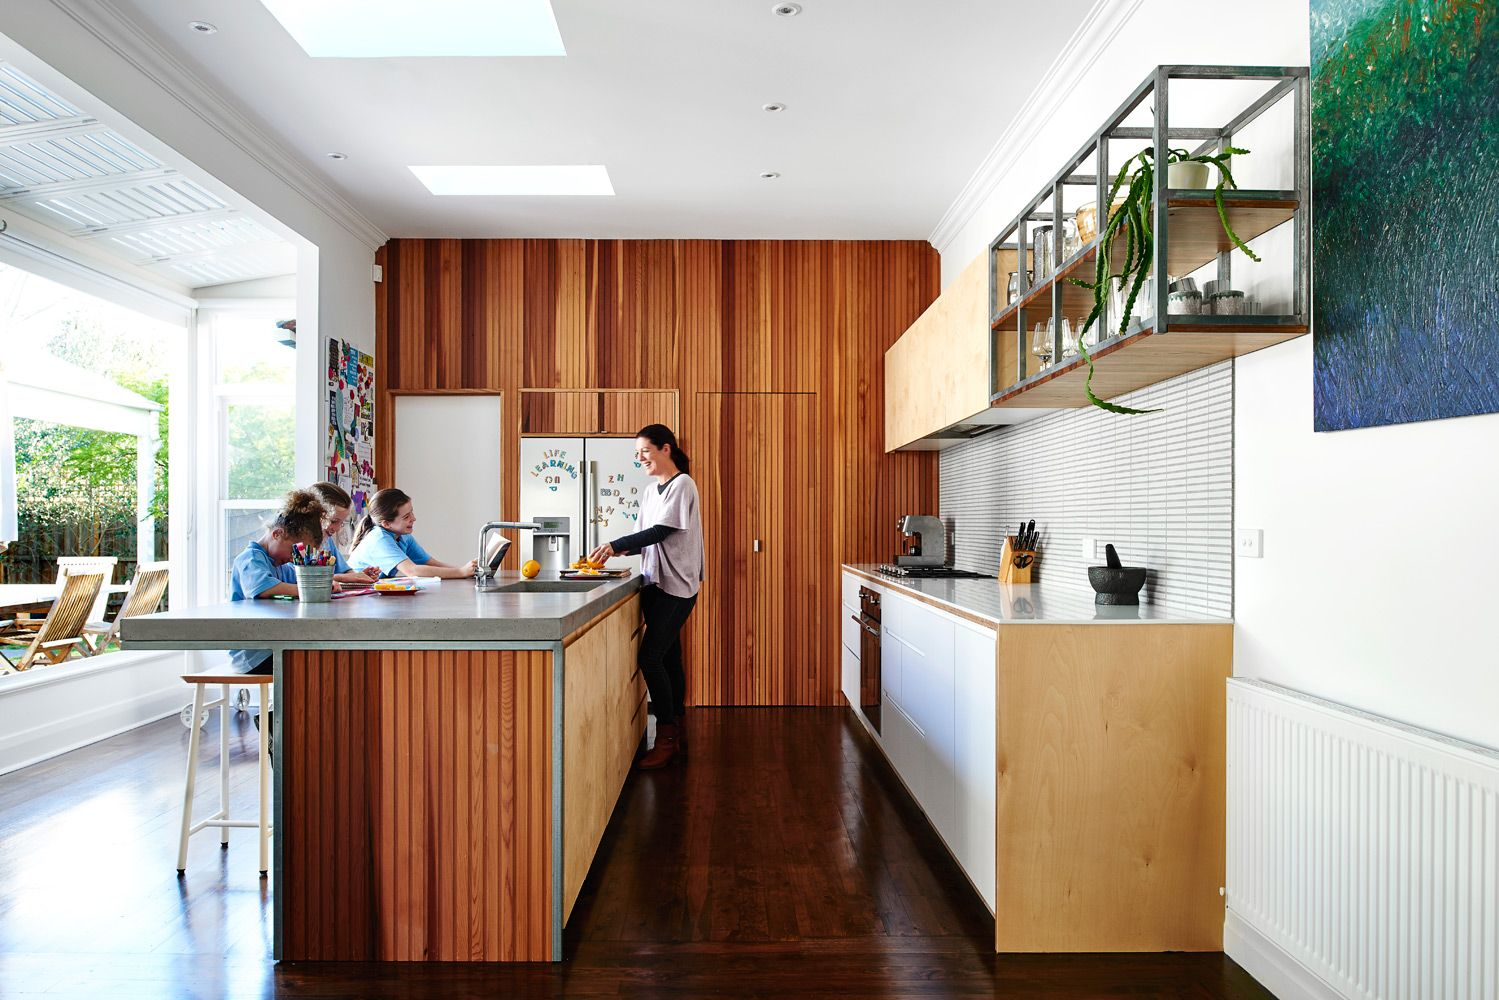 Brighton East Interior | Brighton, Interiors and Timber kitchen